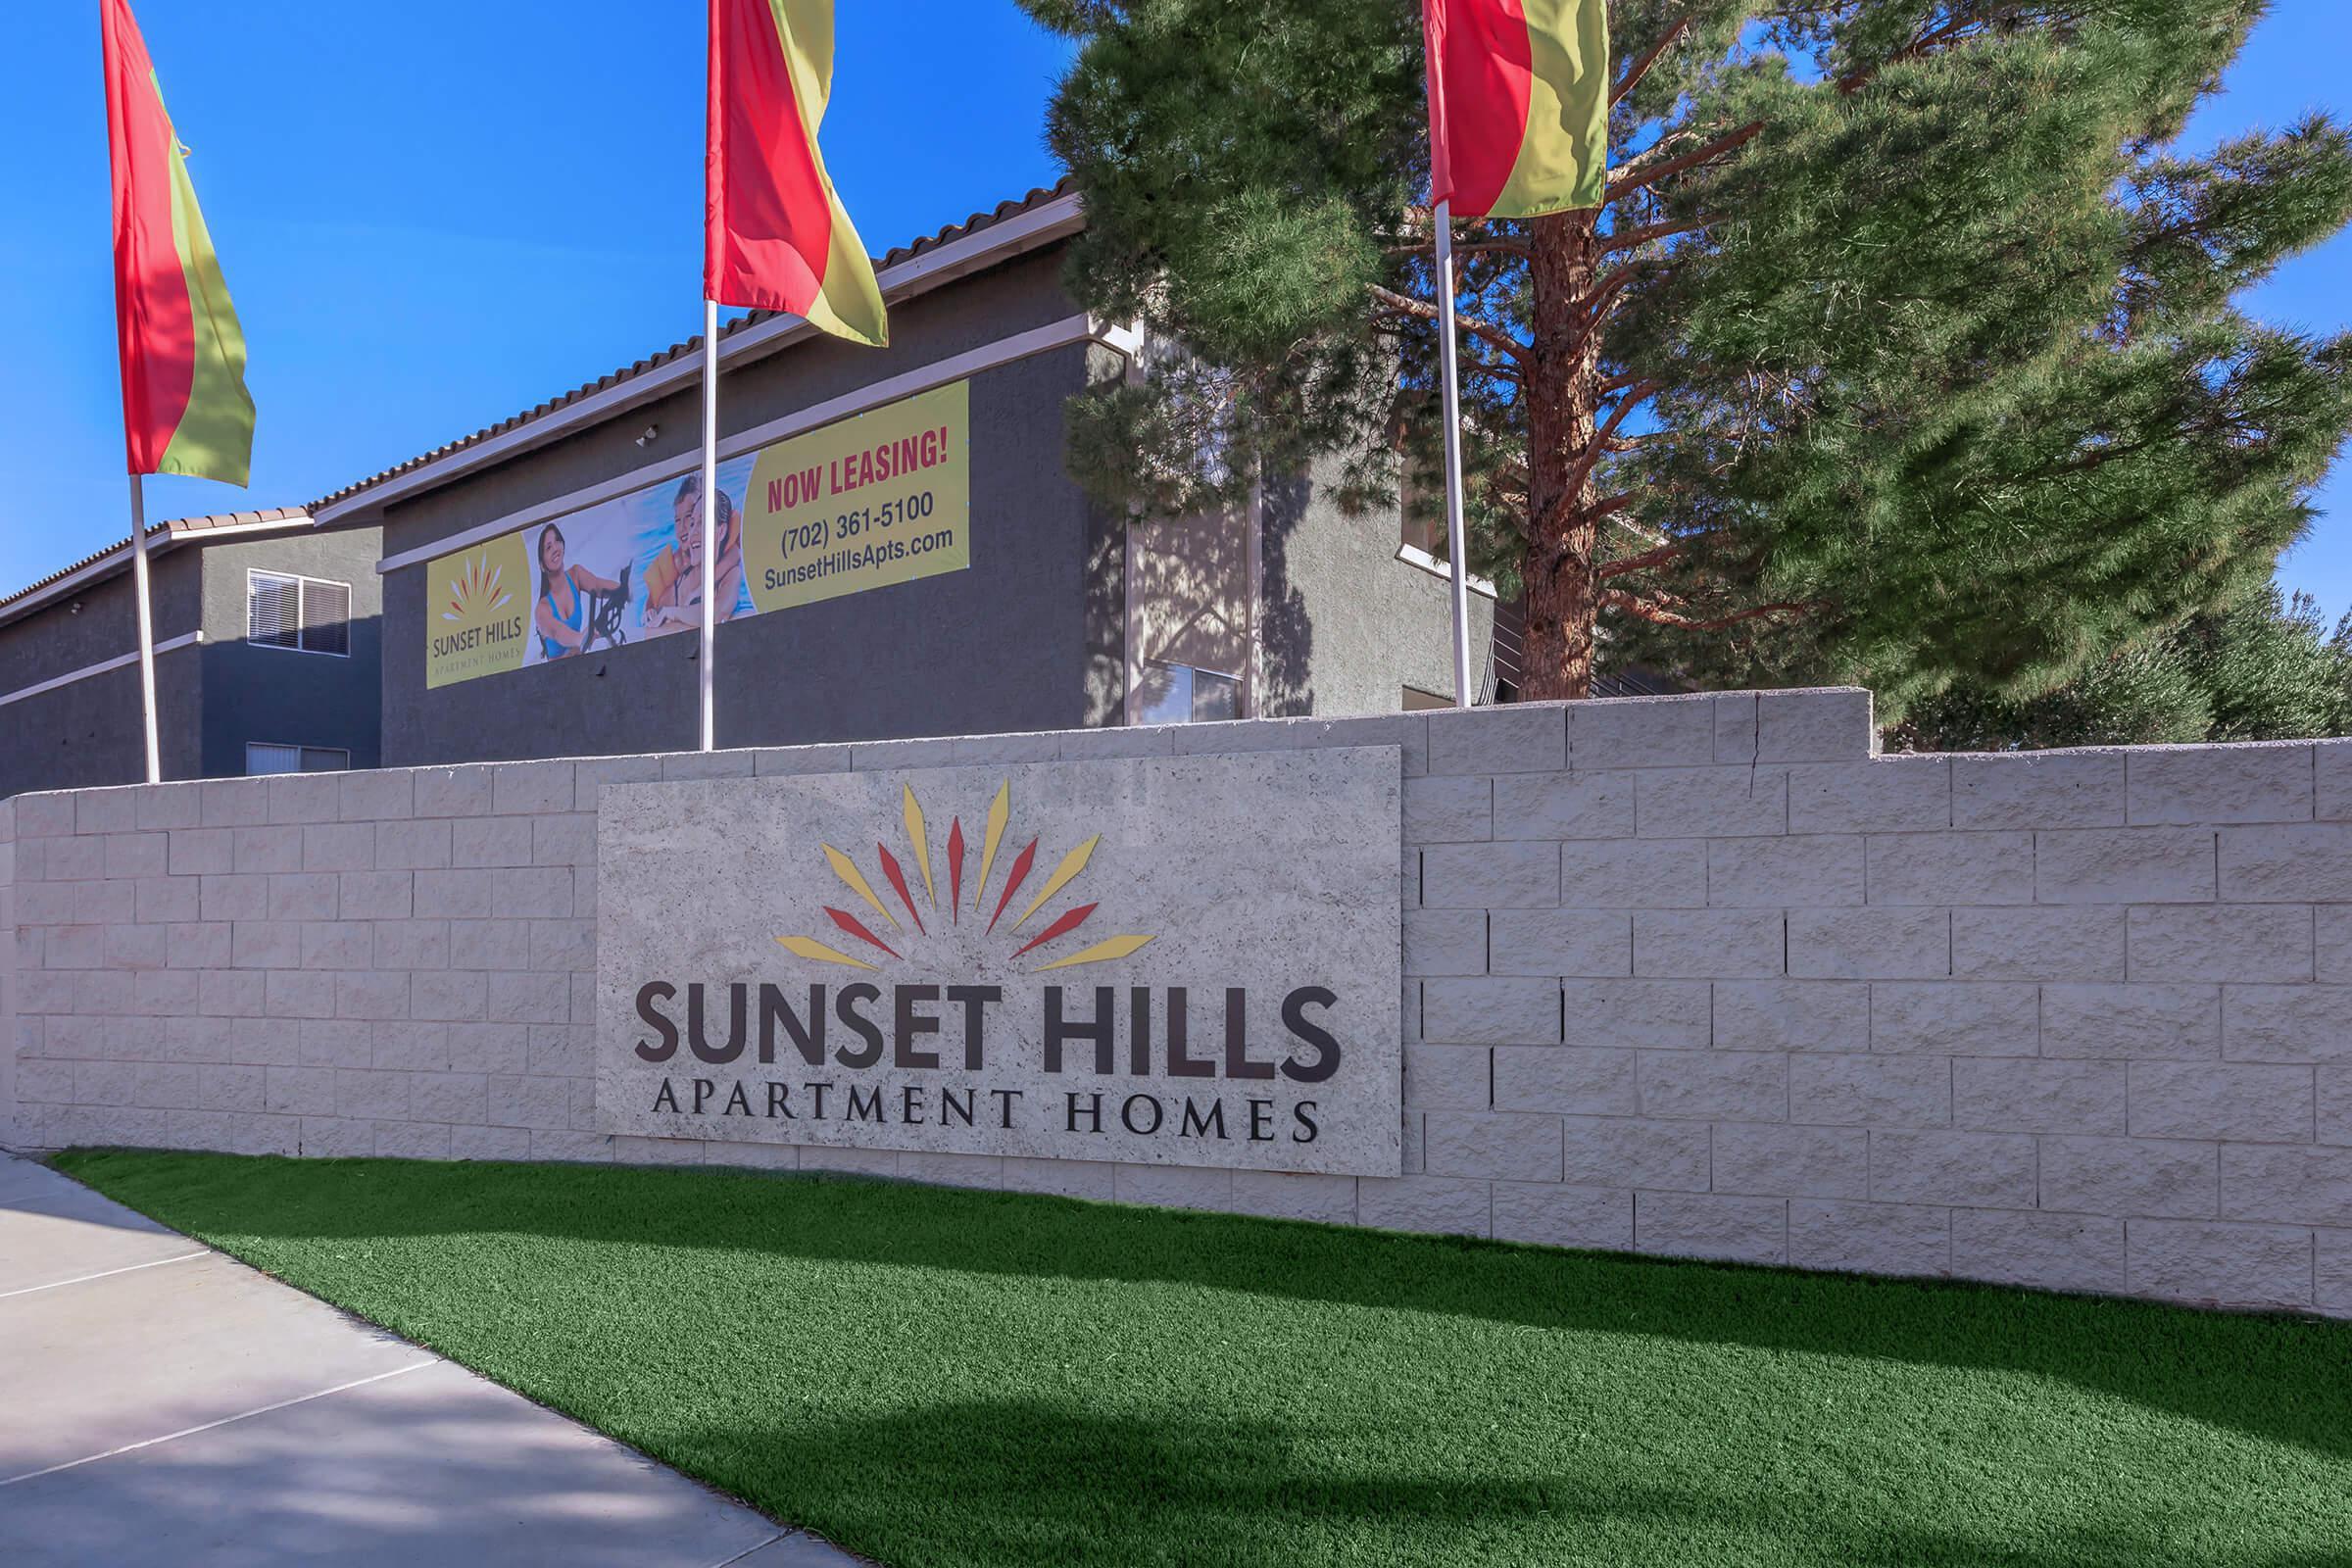 Sunset Hills rental